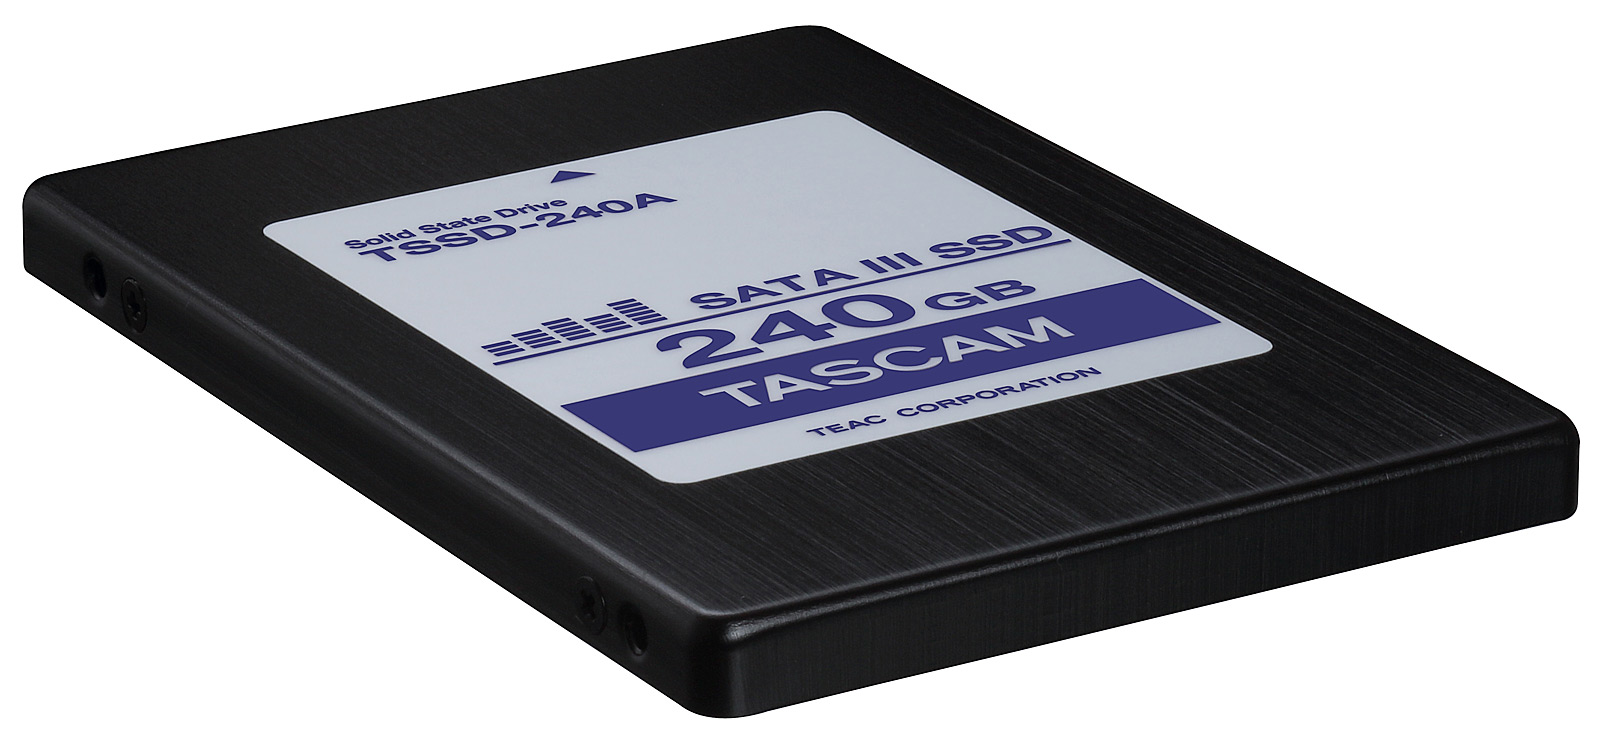 Tascam TSSD-240A SSD harddisk 250GB til DA-6400